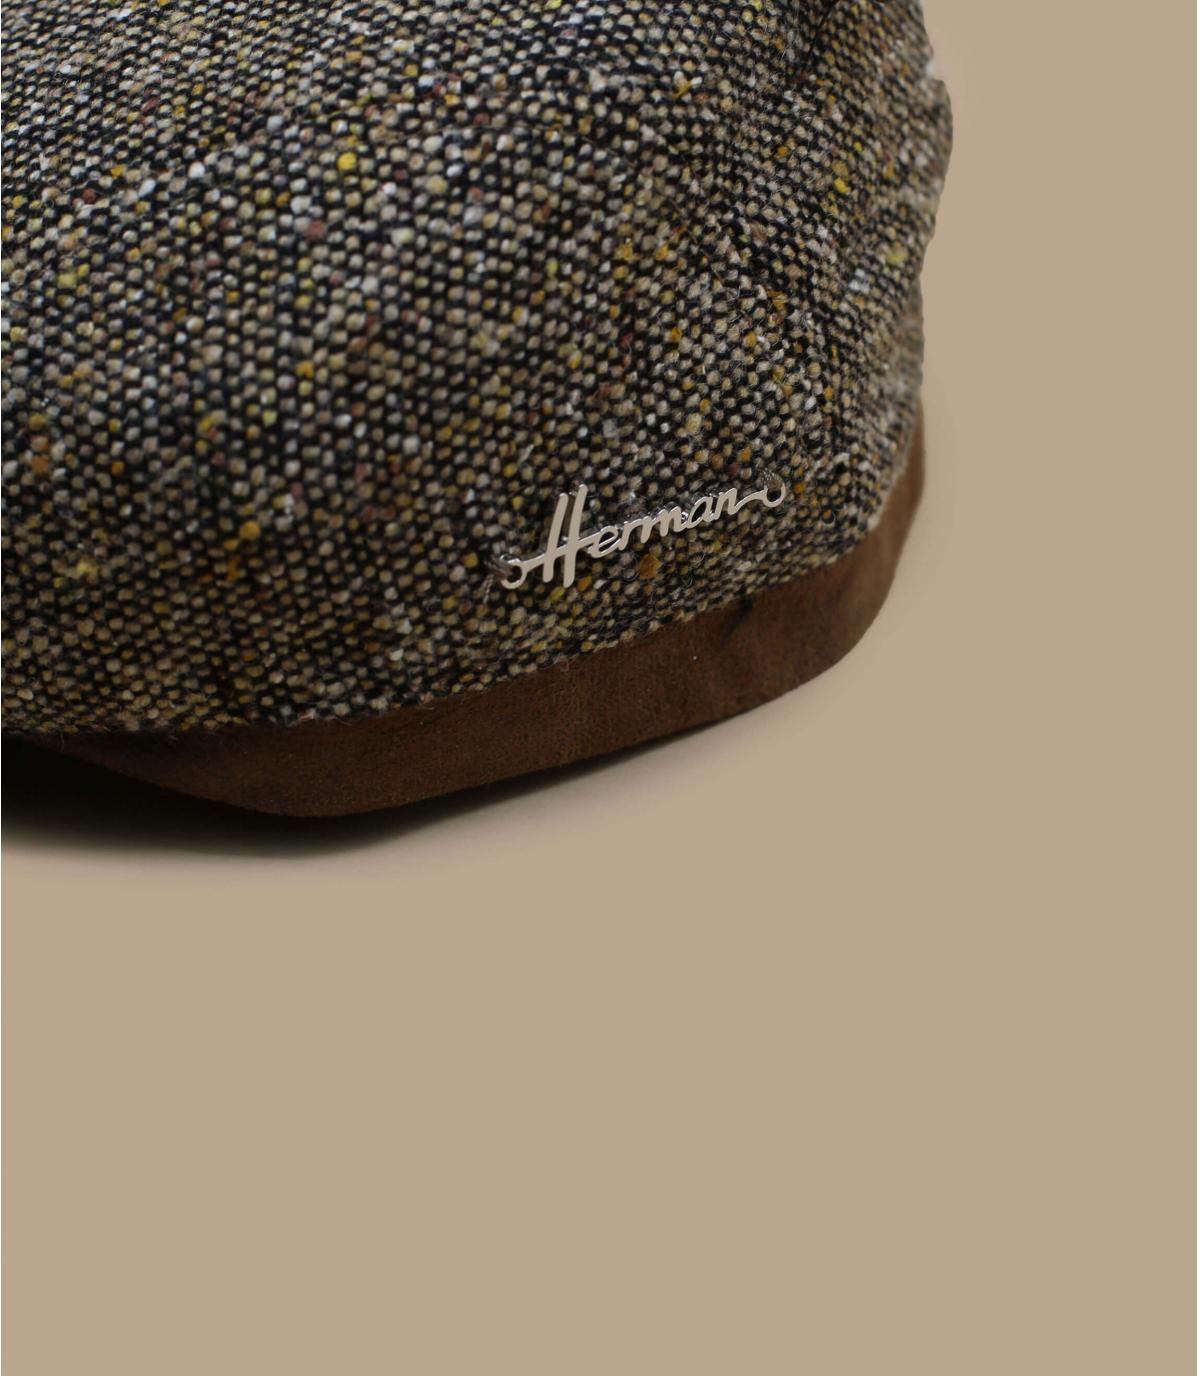 Dettagli Grasberg Wool taupe - image 2